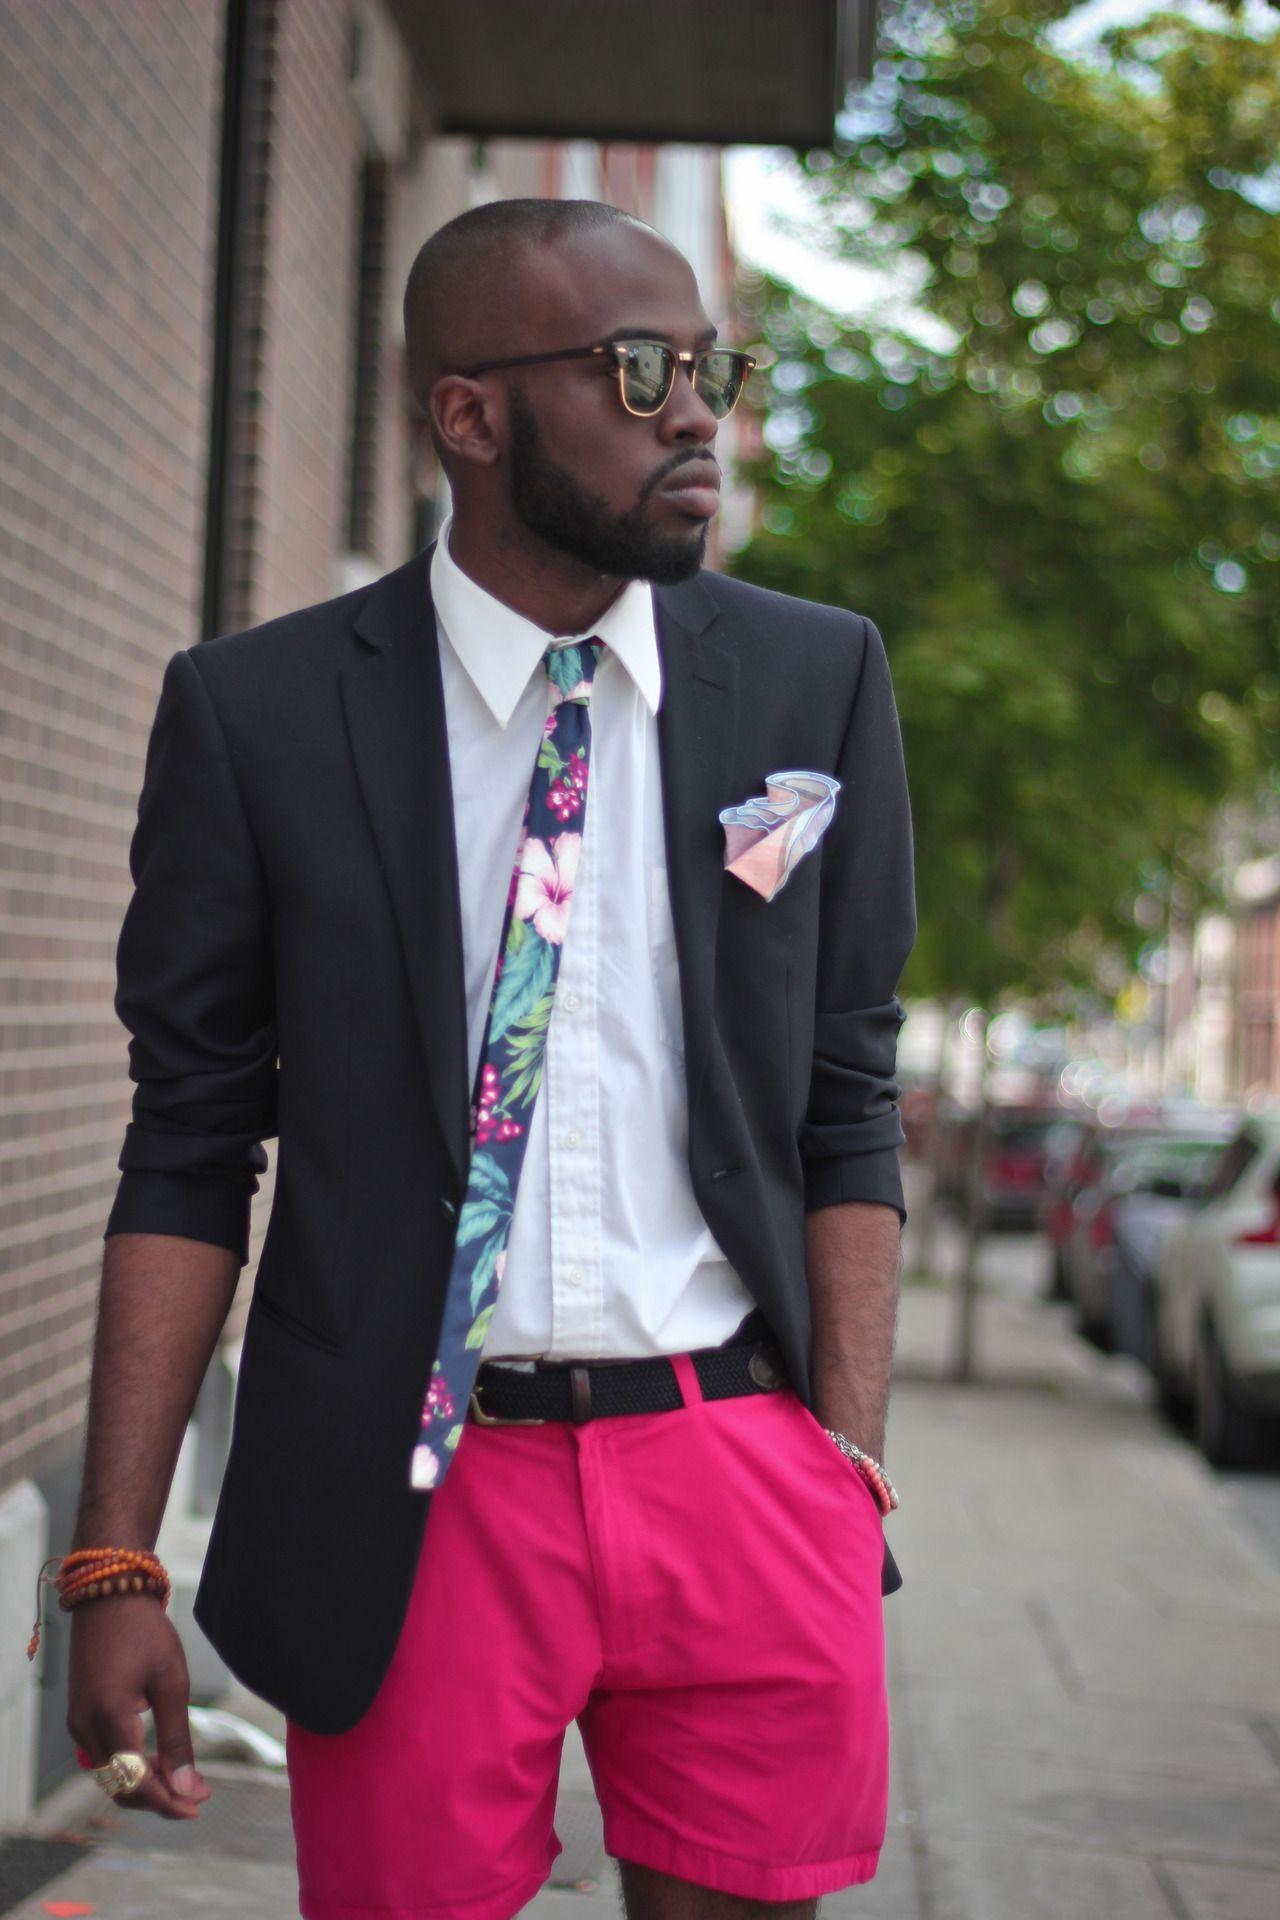 summer suit - I would prefer shorts a little longer